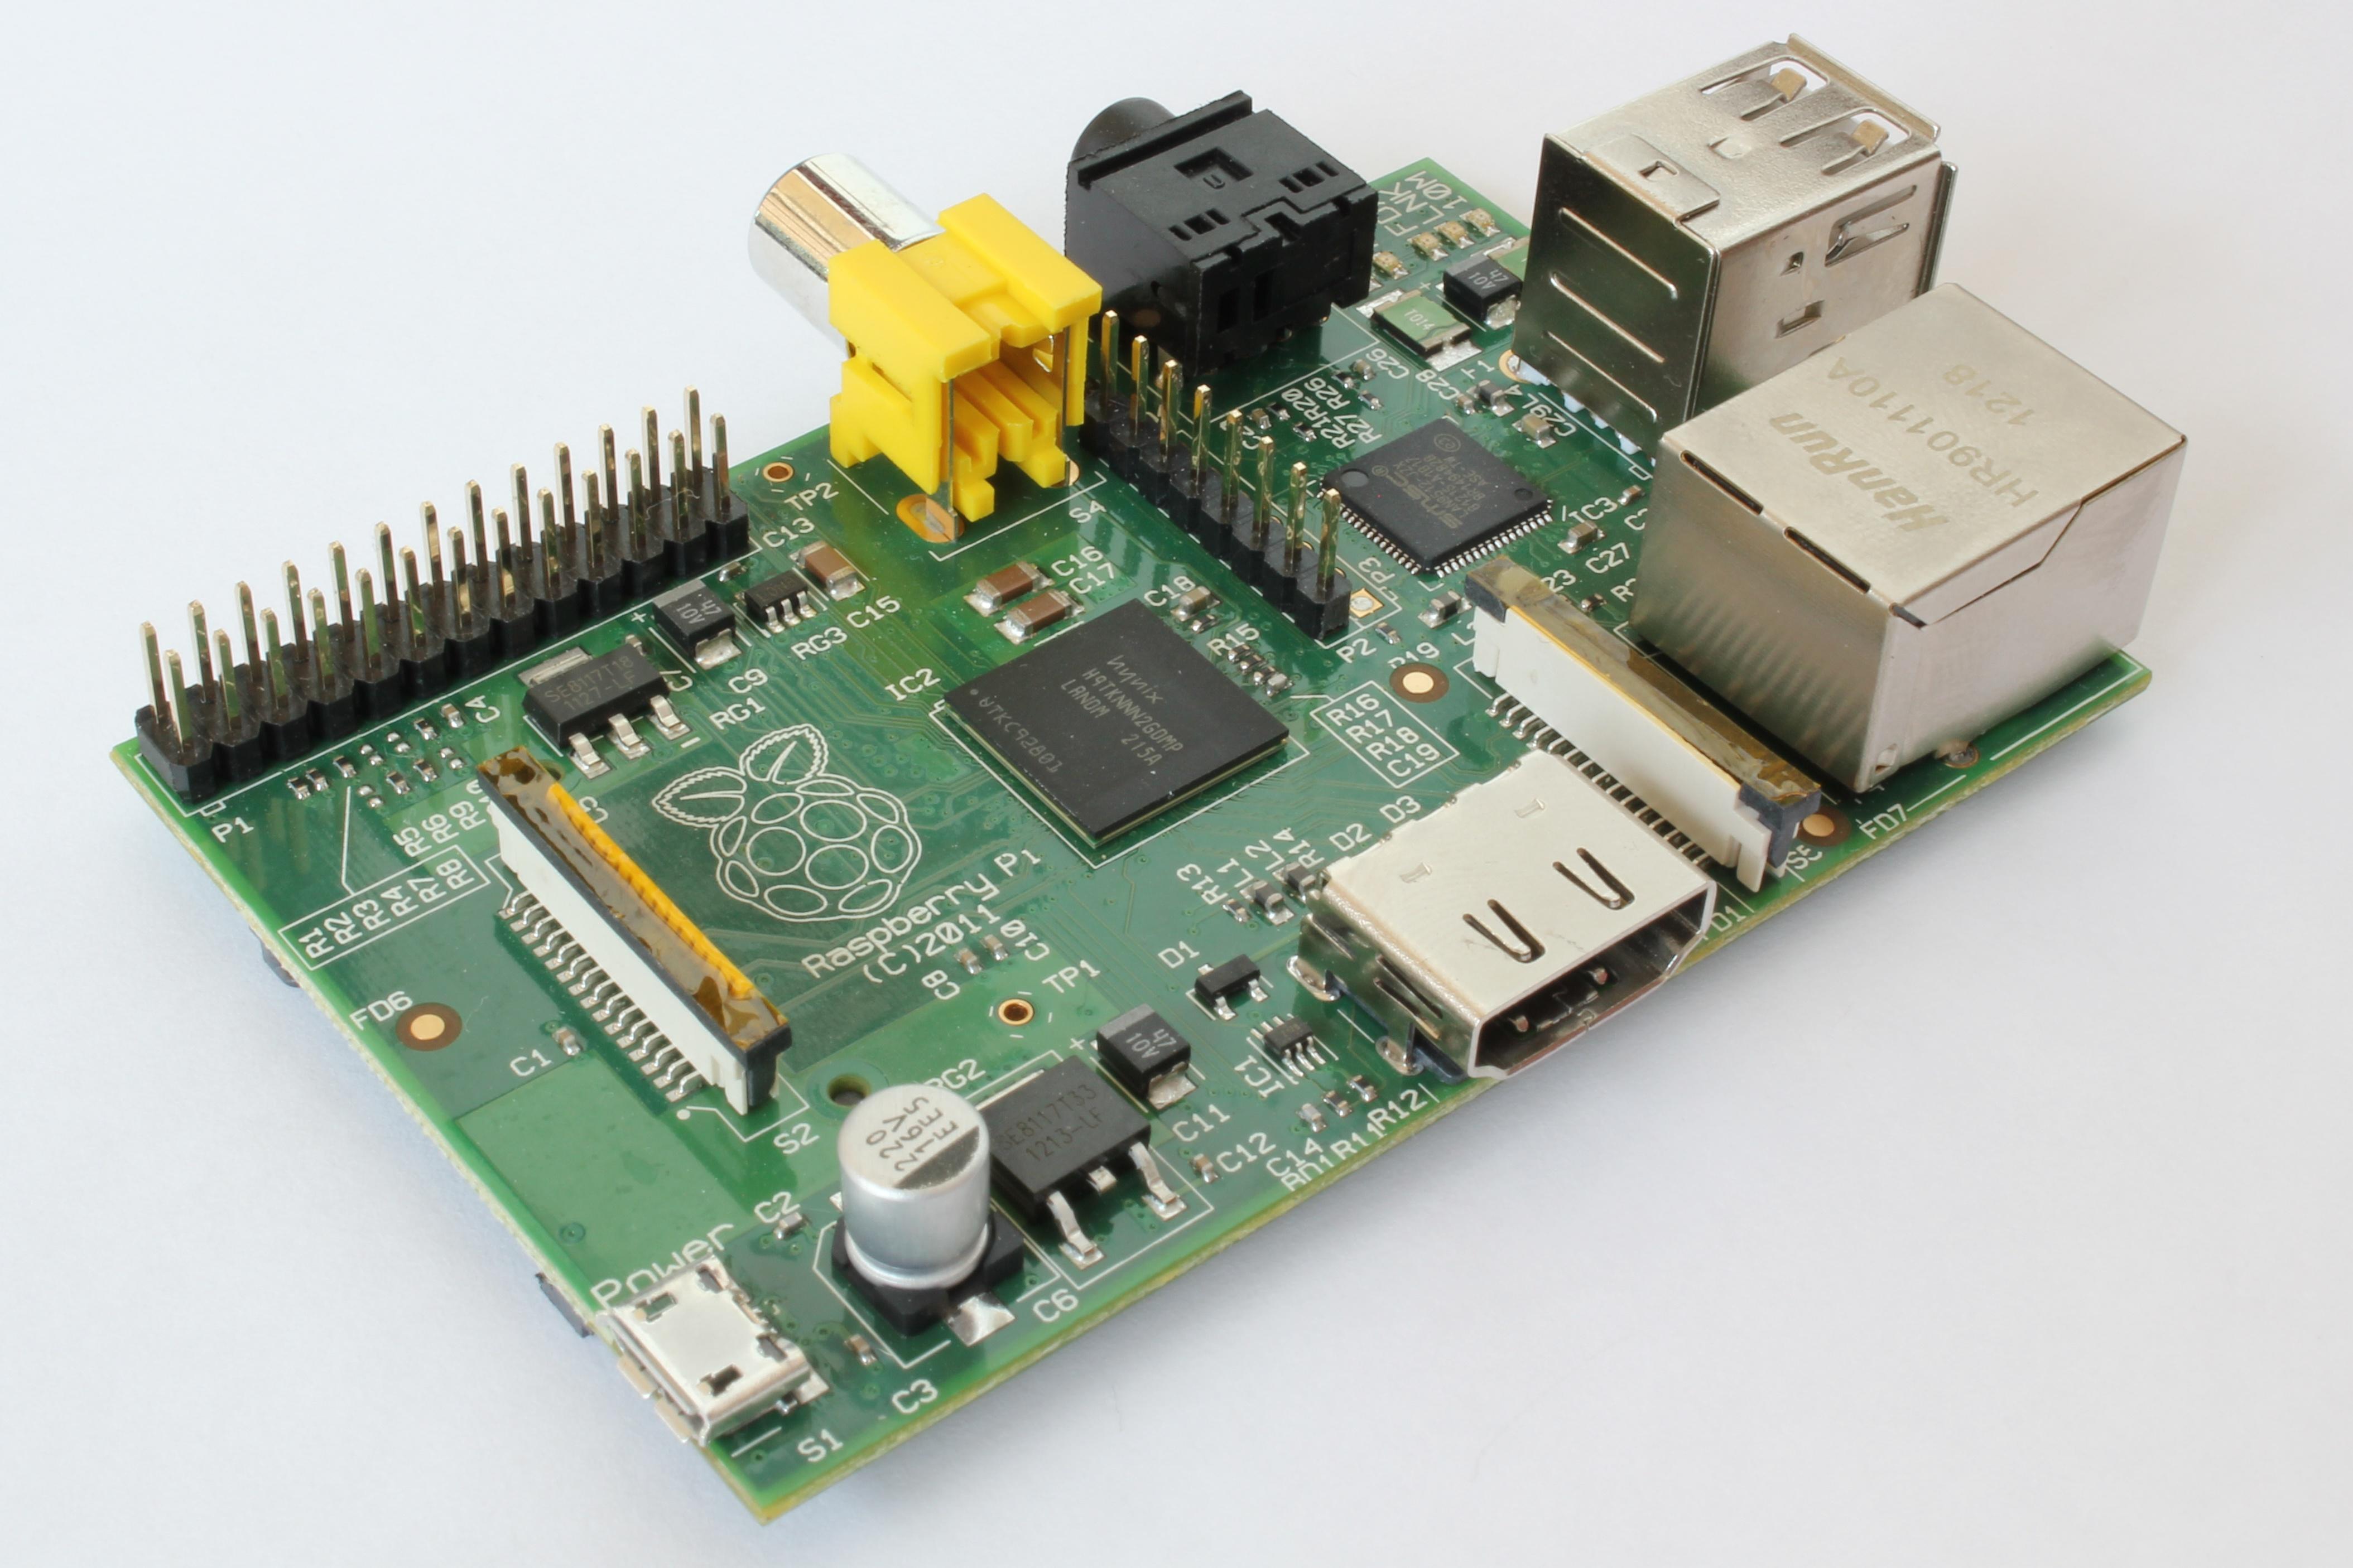 Raspberry Pi internal hardware random number generator - A